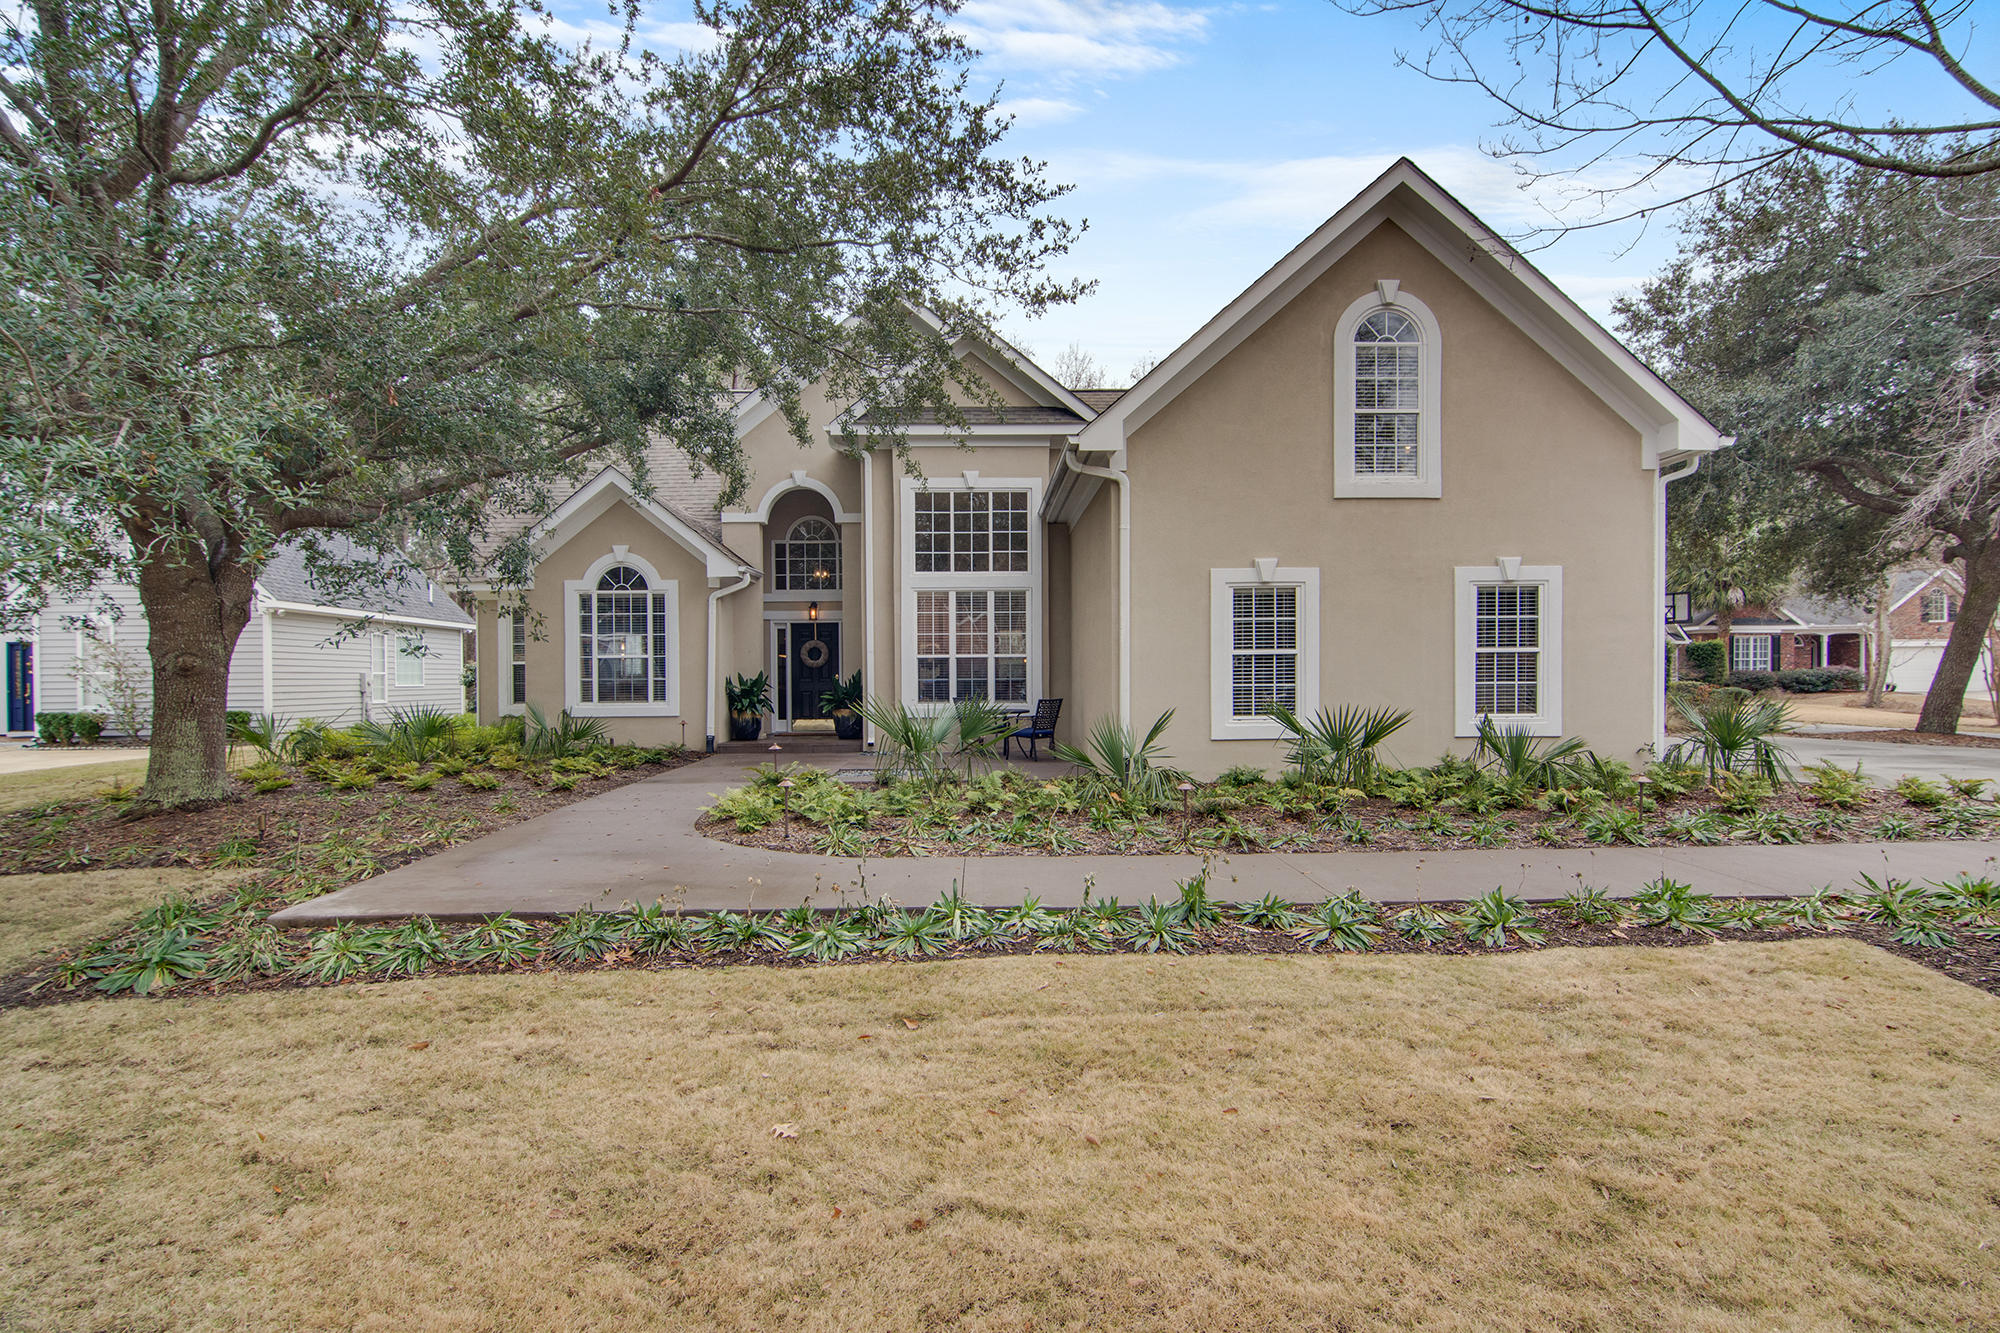 Home for sale 1306 Old Ivy Way, Brickyard Plantation, Mt. Pleasant, SC